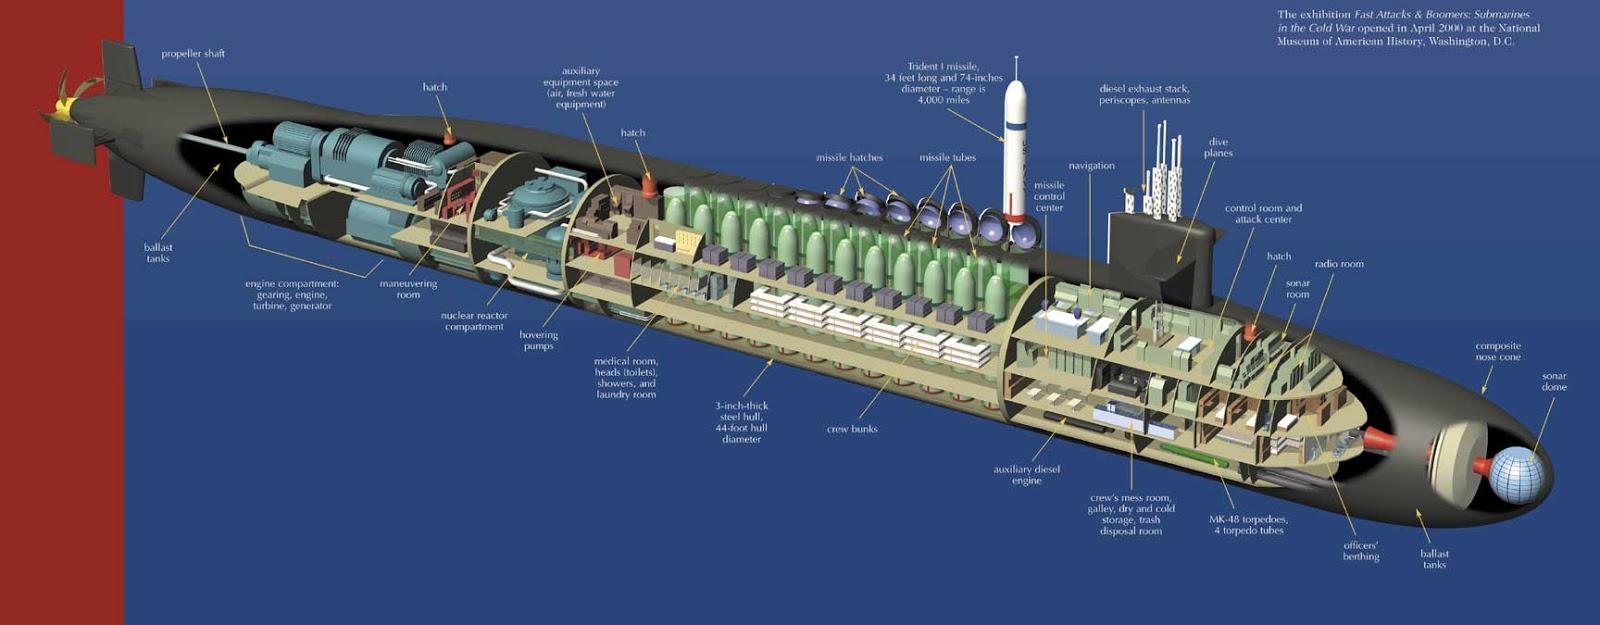 Submarine    Matters  Woman in    US       Navy       Submarines